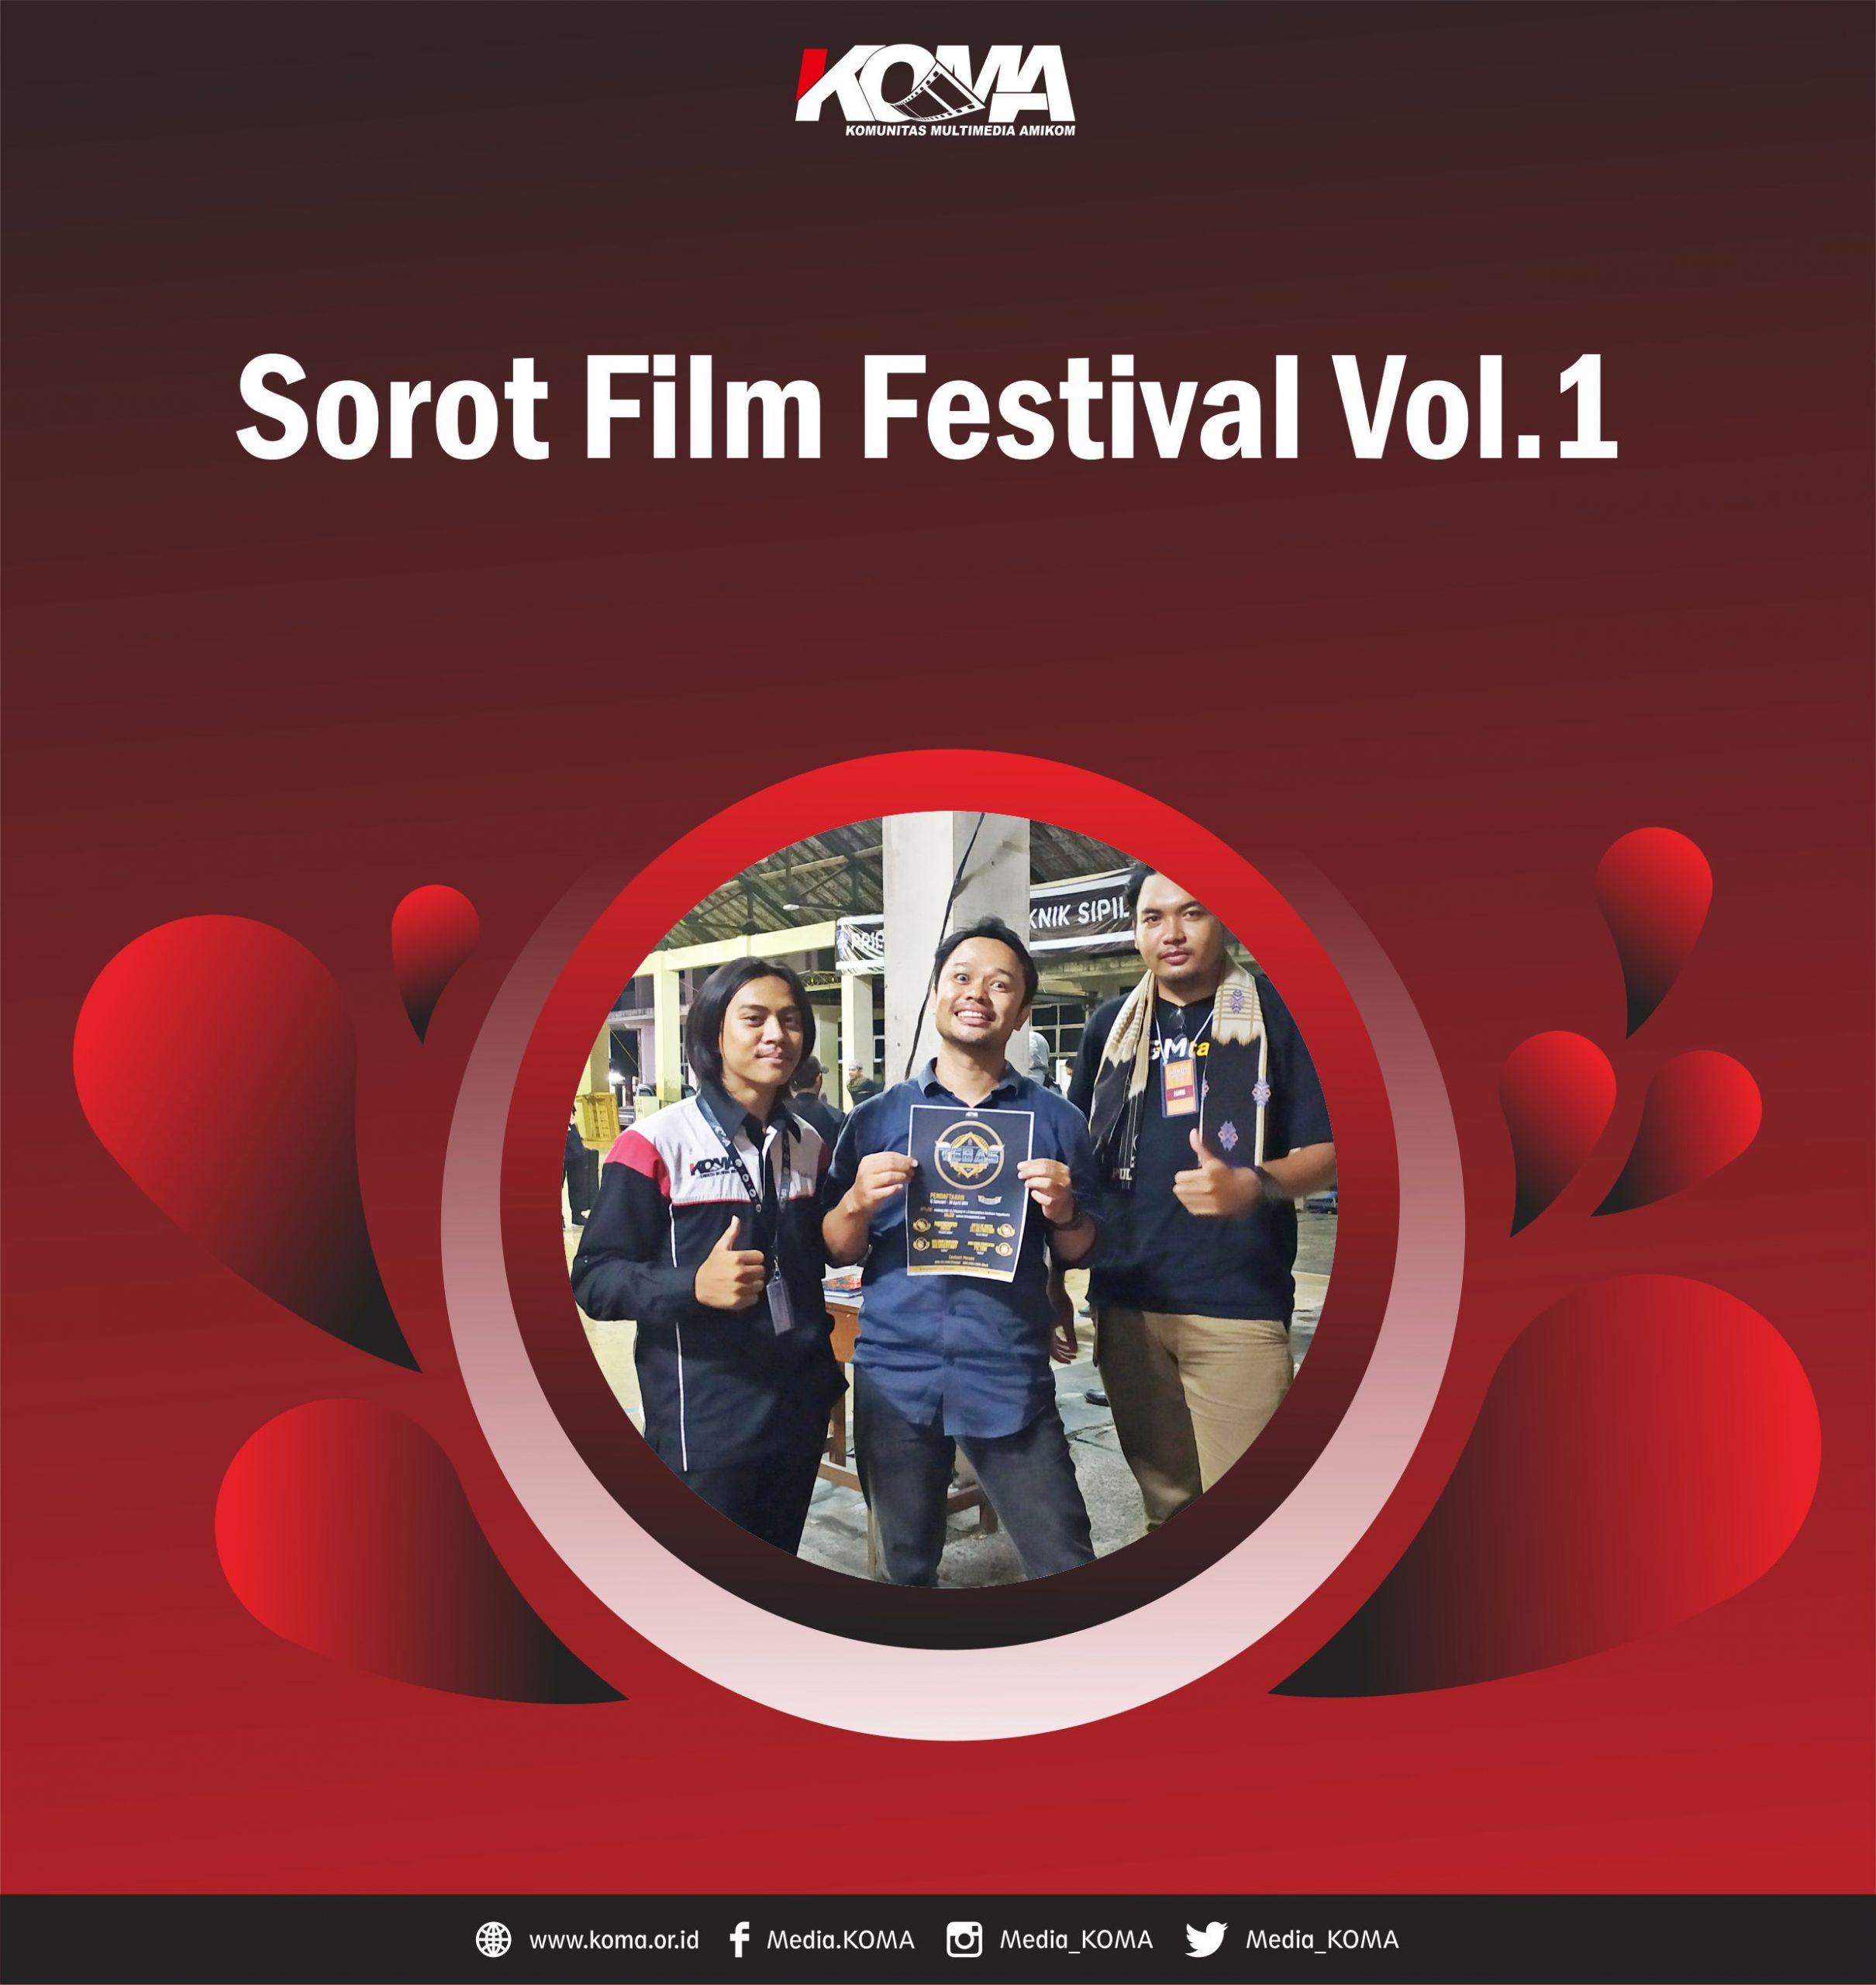 Sorot-Film-Festival-Vol.1